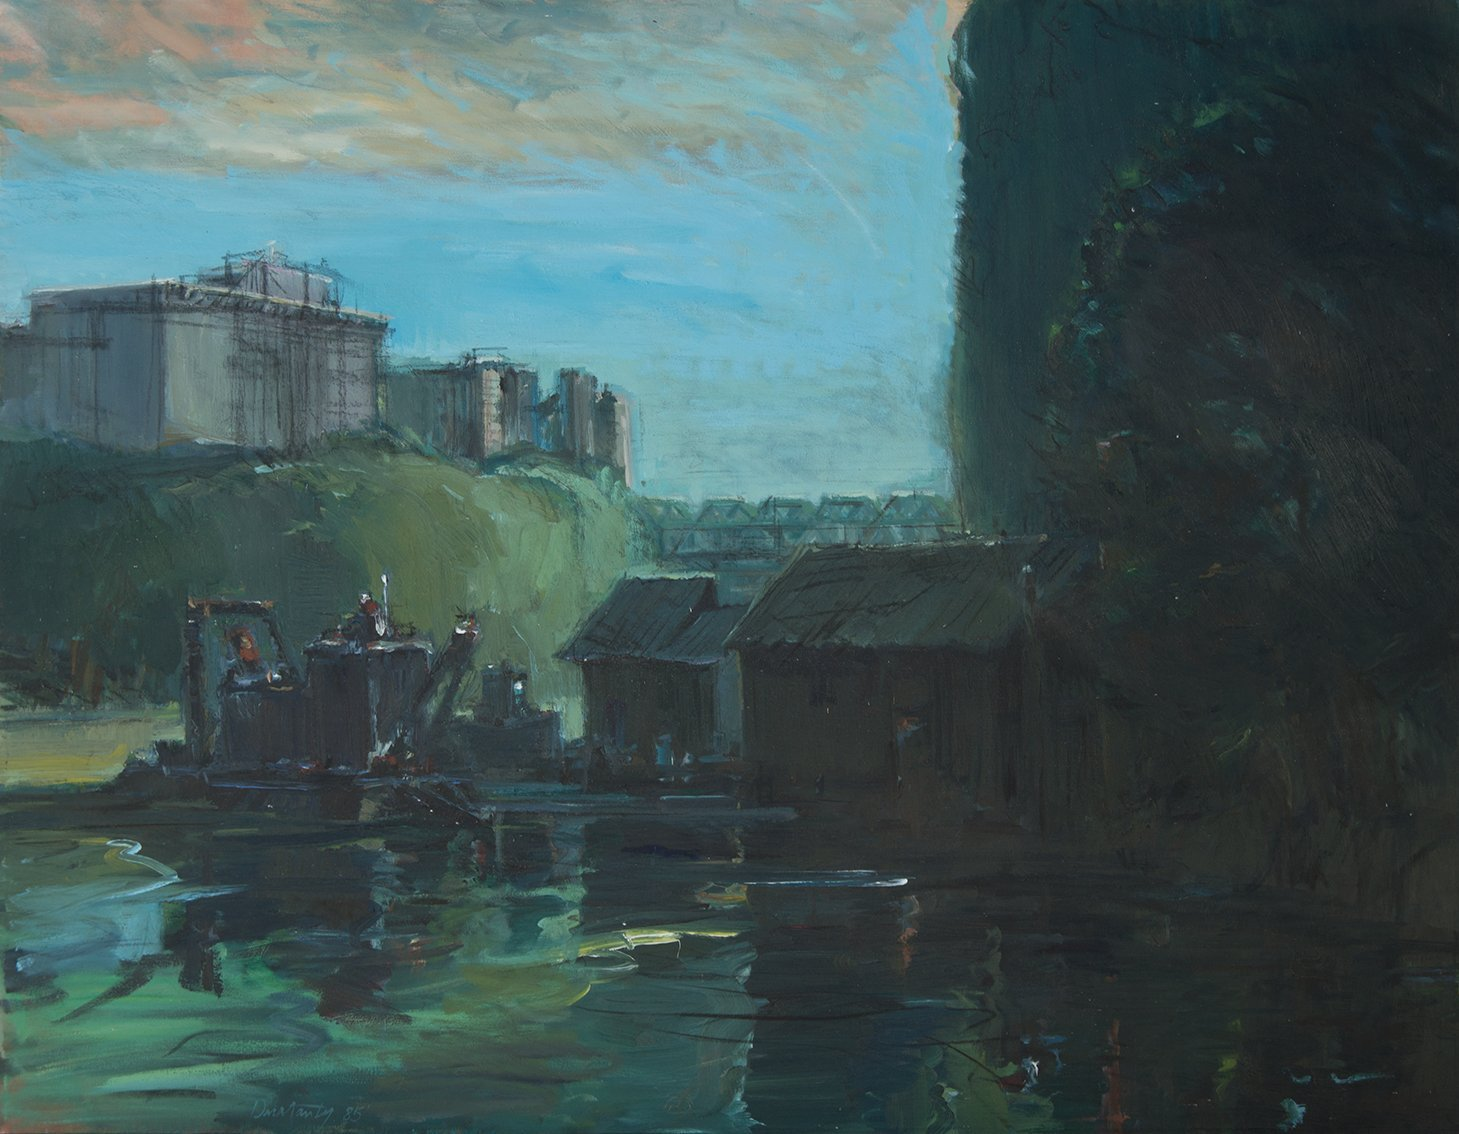 Patrick Dullanty, River Marina, 1985